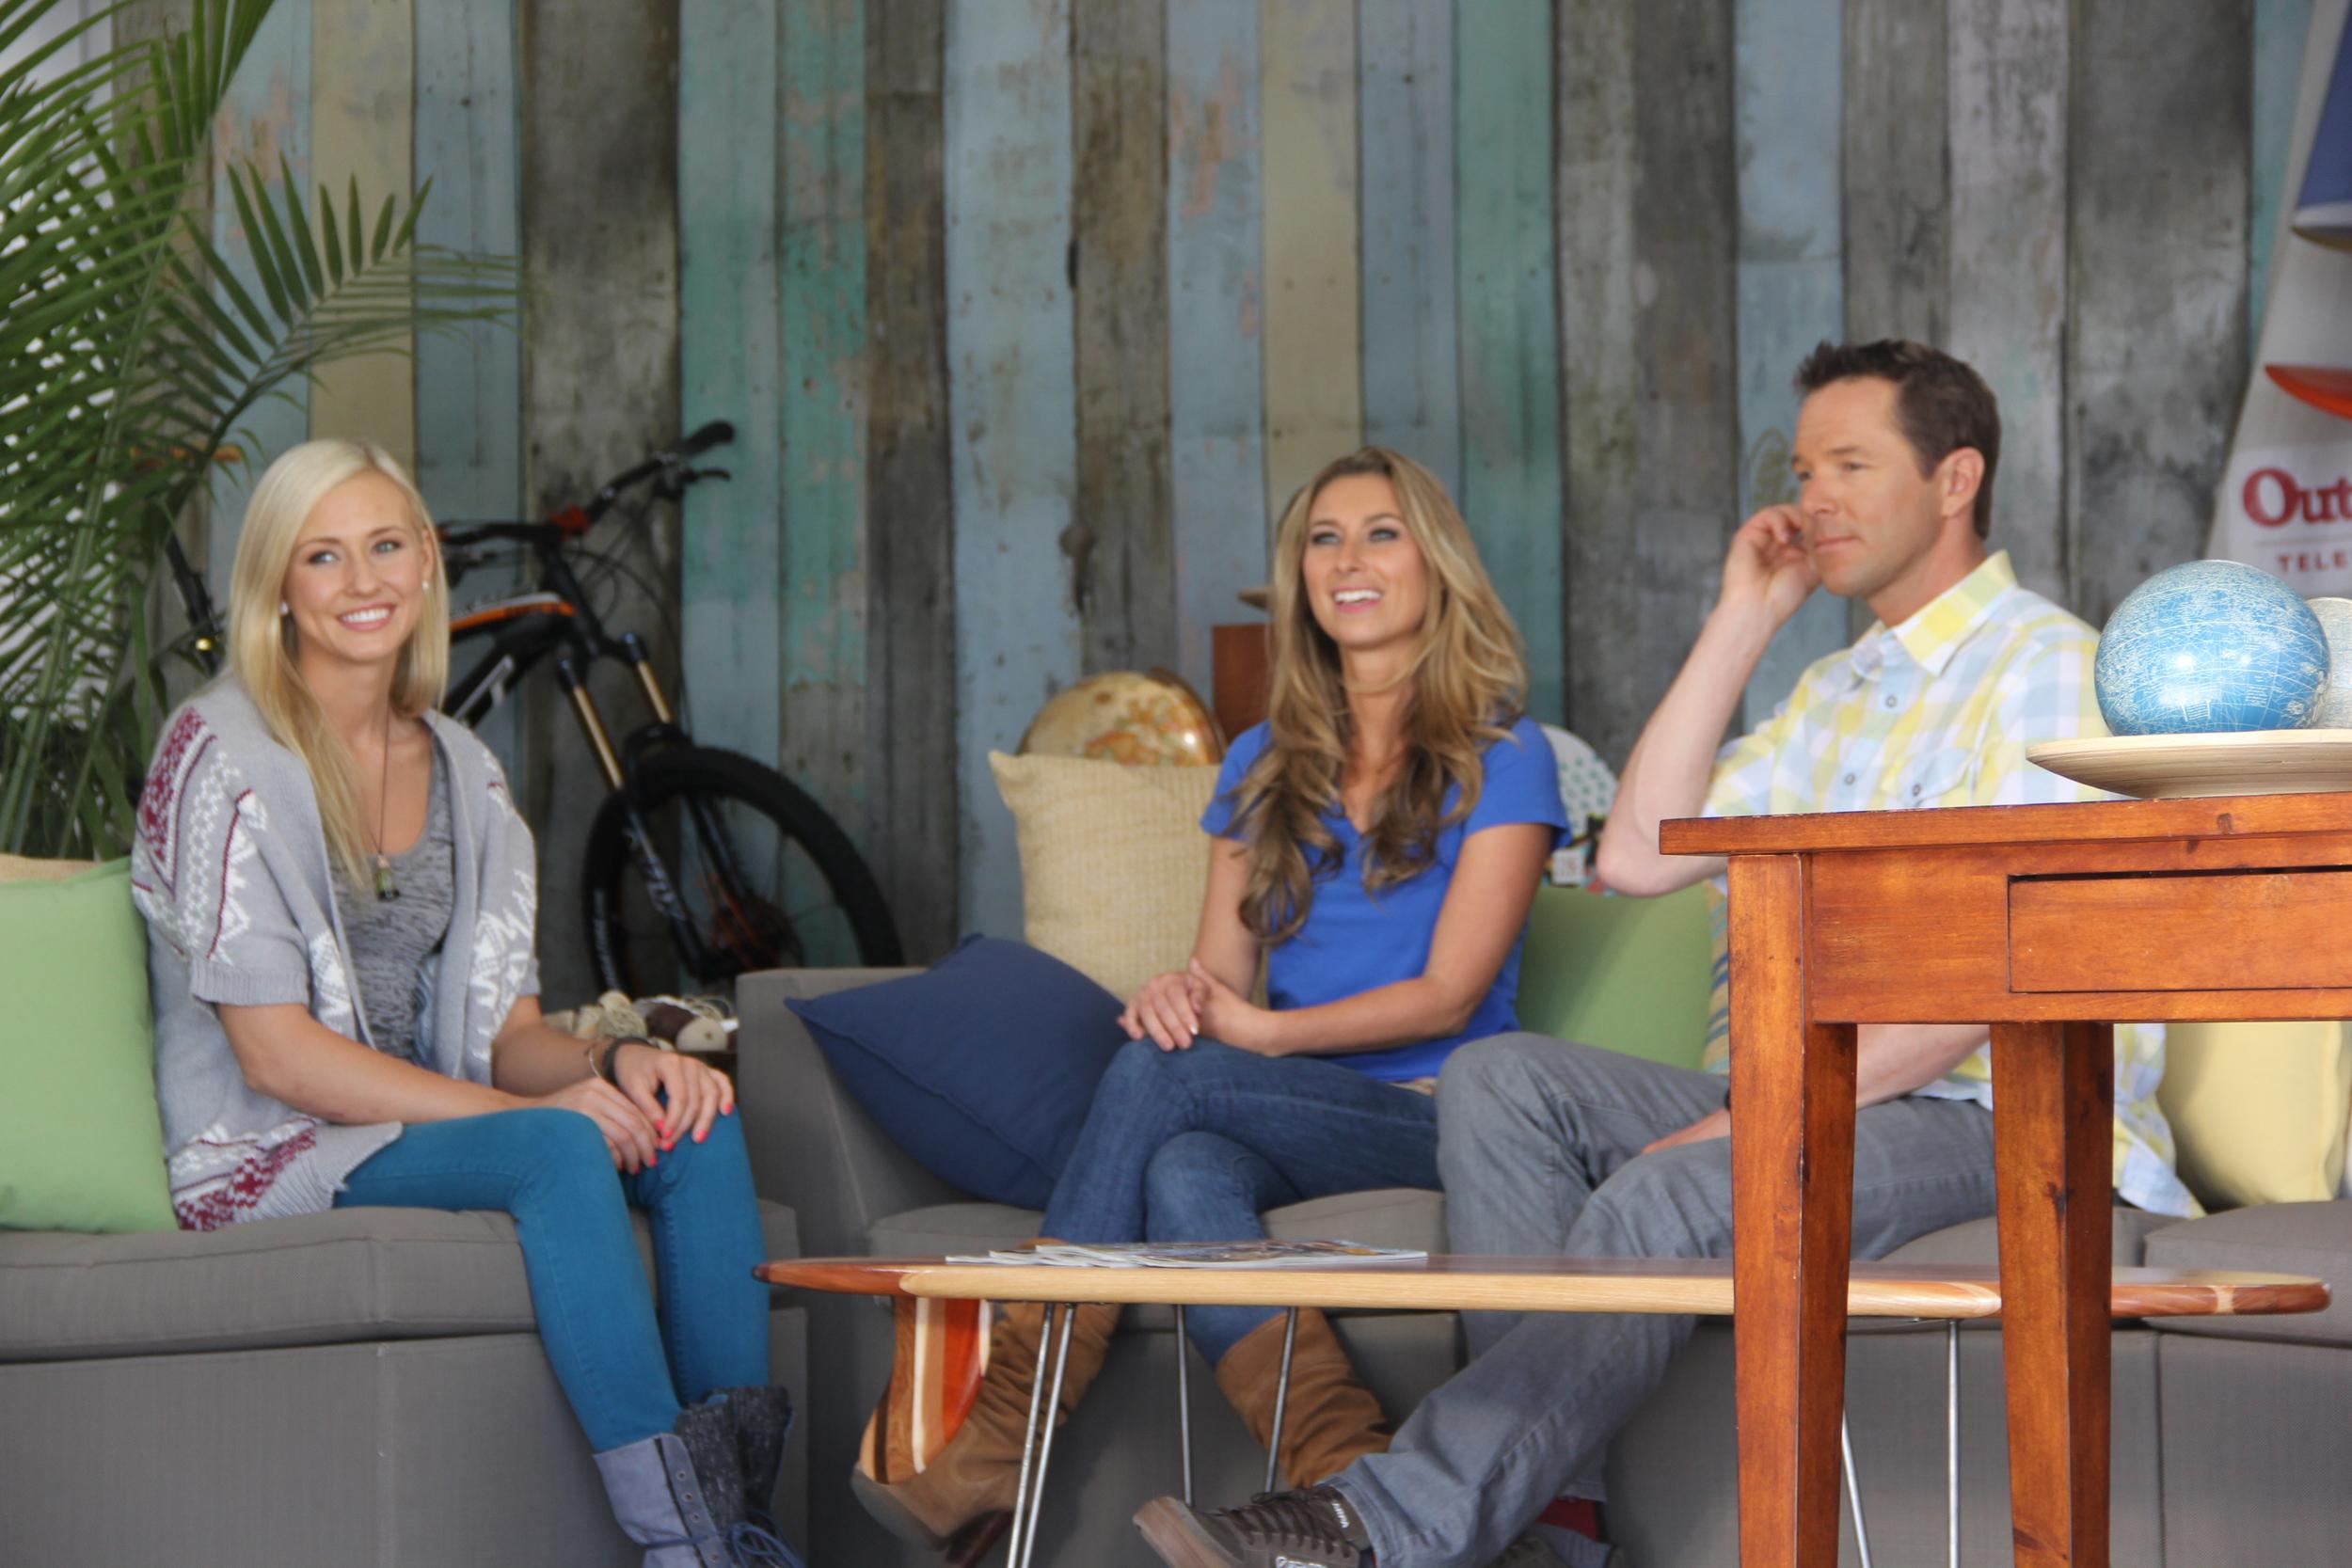 Sierra Blair-Coyle, Julia Dimon, & Chris Davenport on the set of Outside Television  Malibu, CA